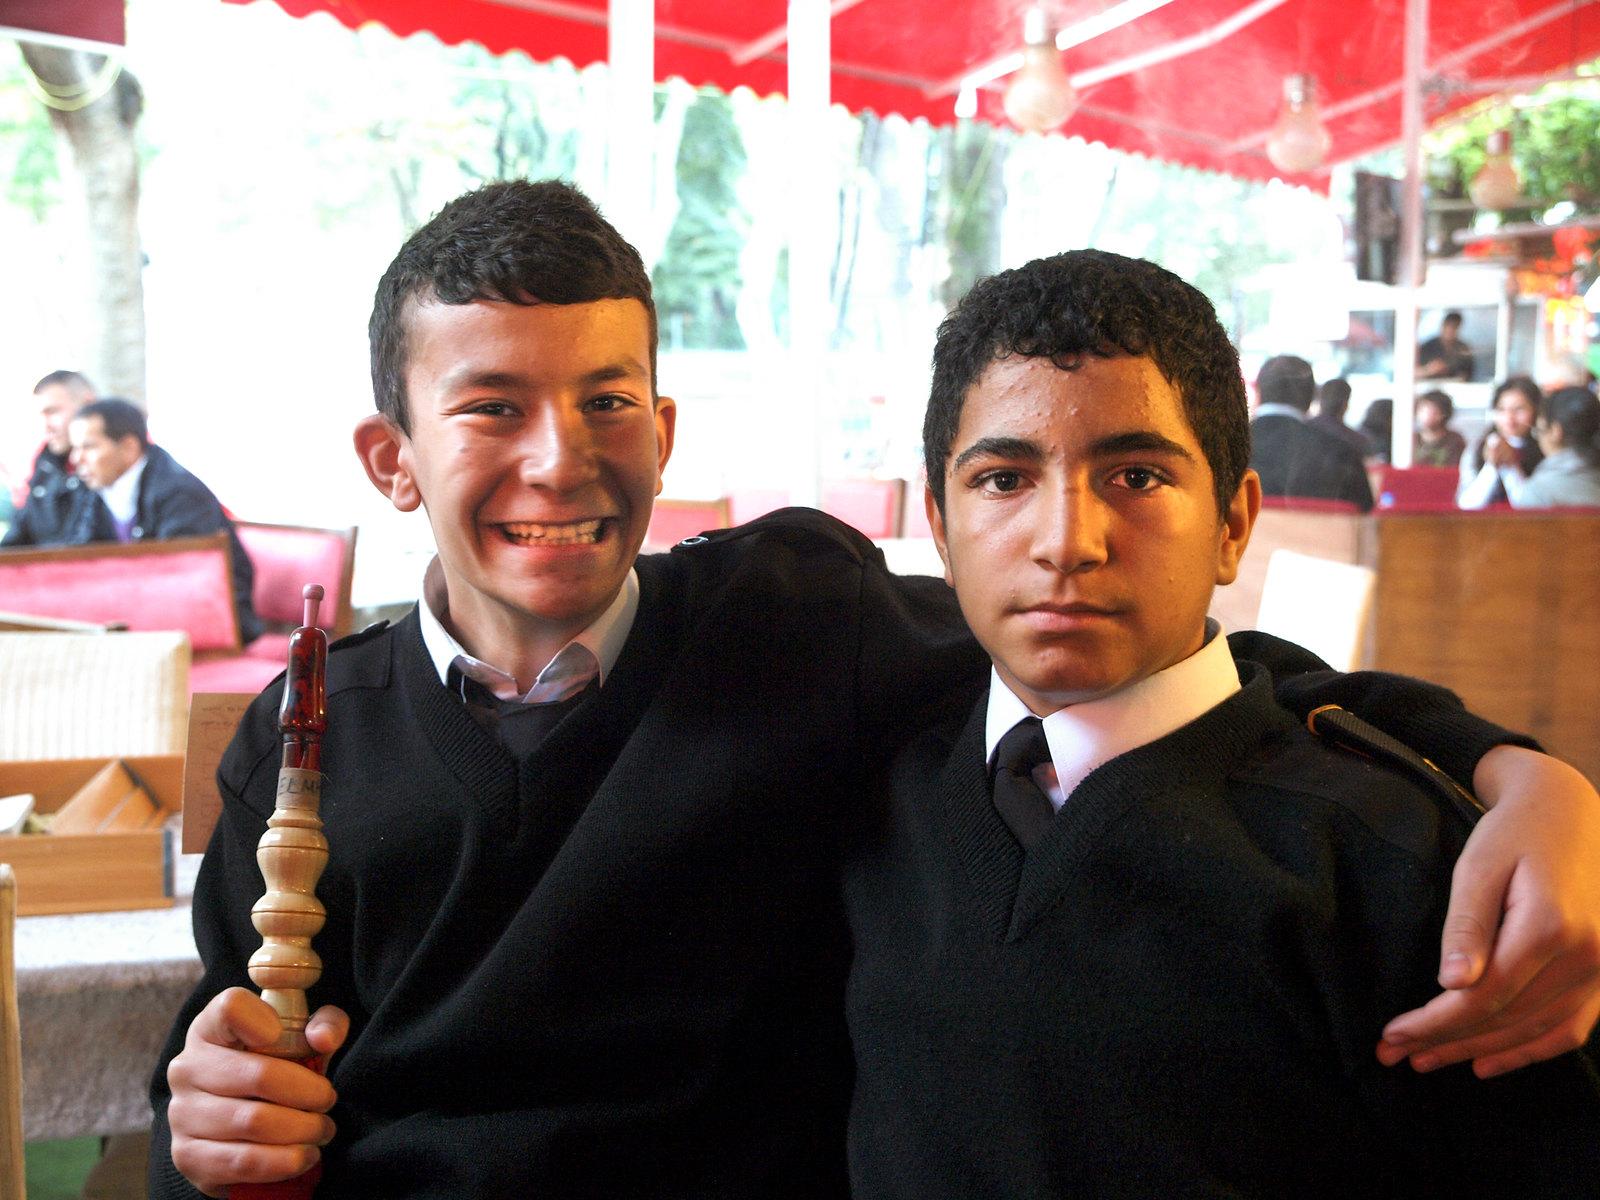 Istanbul - Les apprentis marins